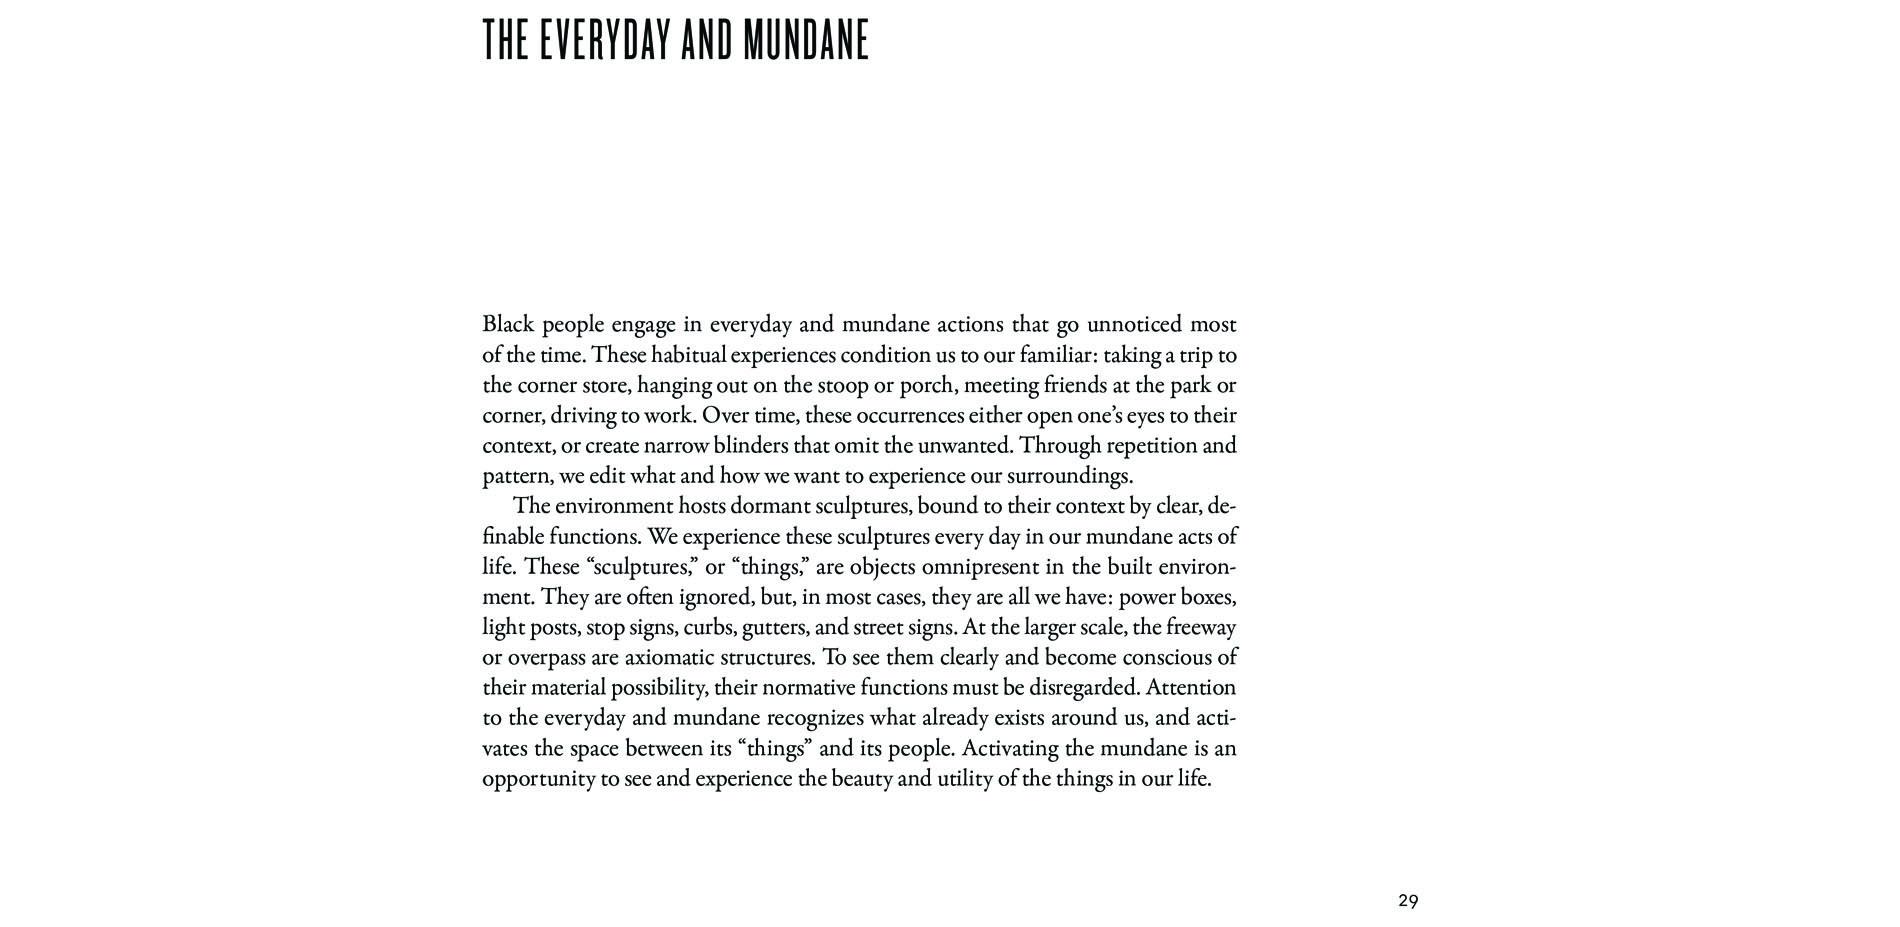 Black Landscapes Matter, The Everyday and Mundane (pg. 29)